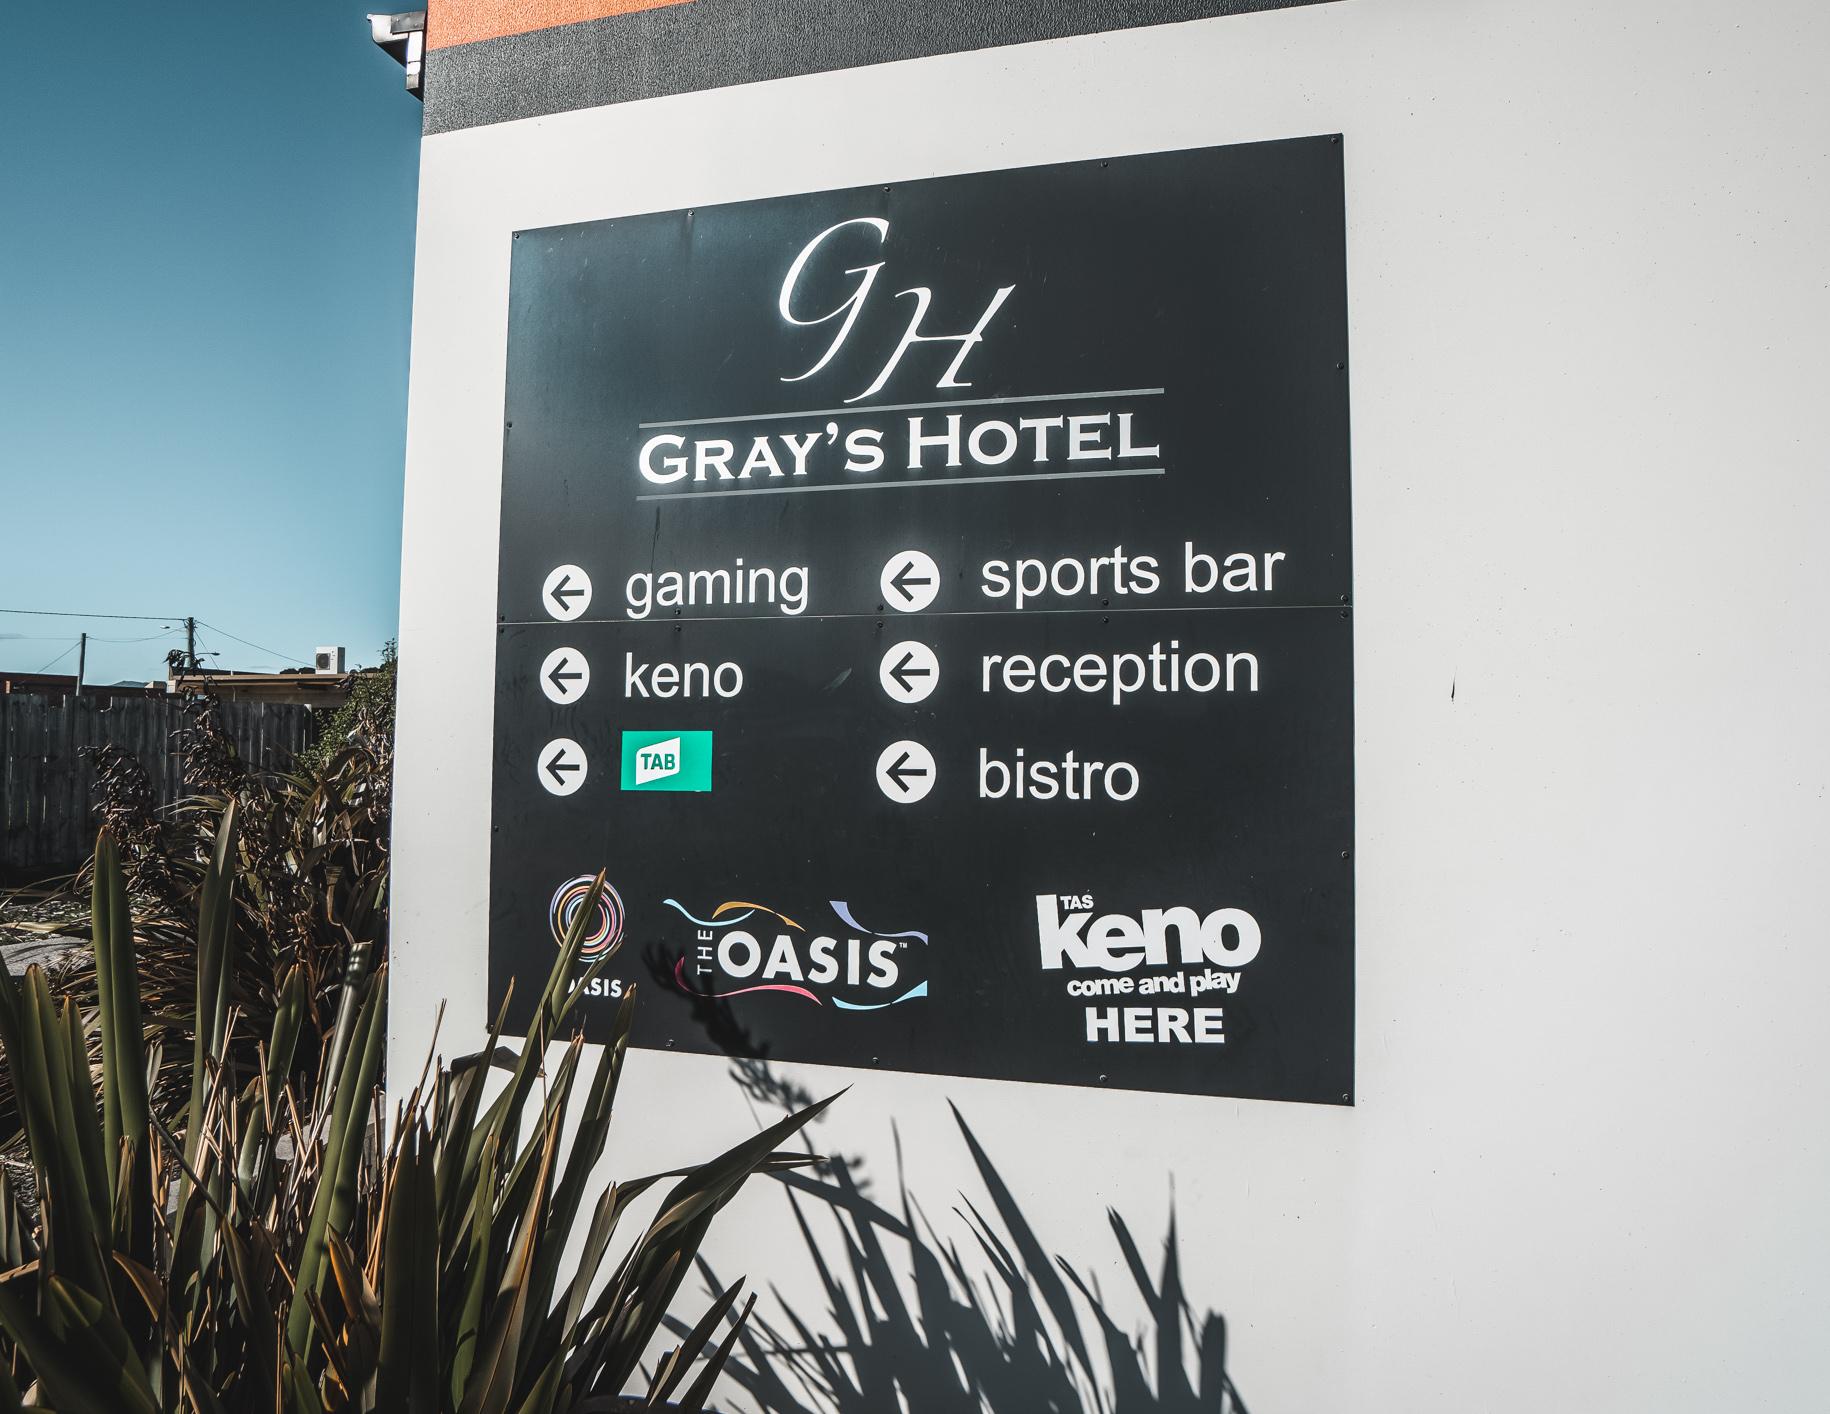 Gray's Hotel (Web) (1 of 16).jpg